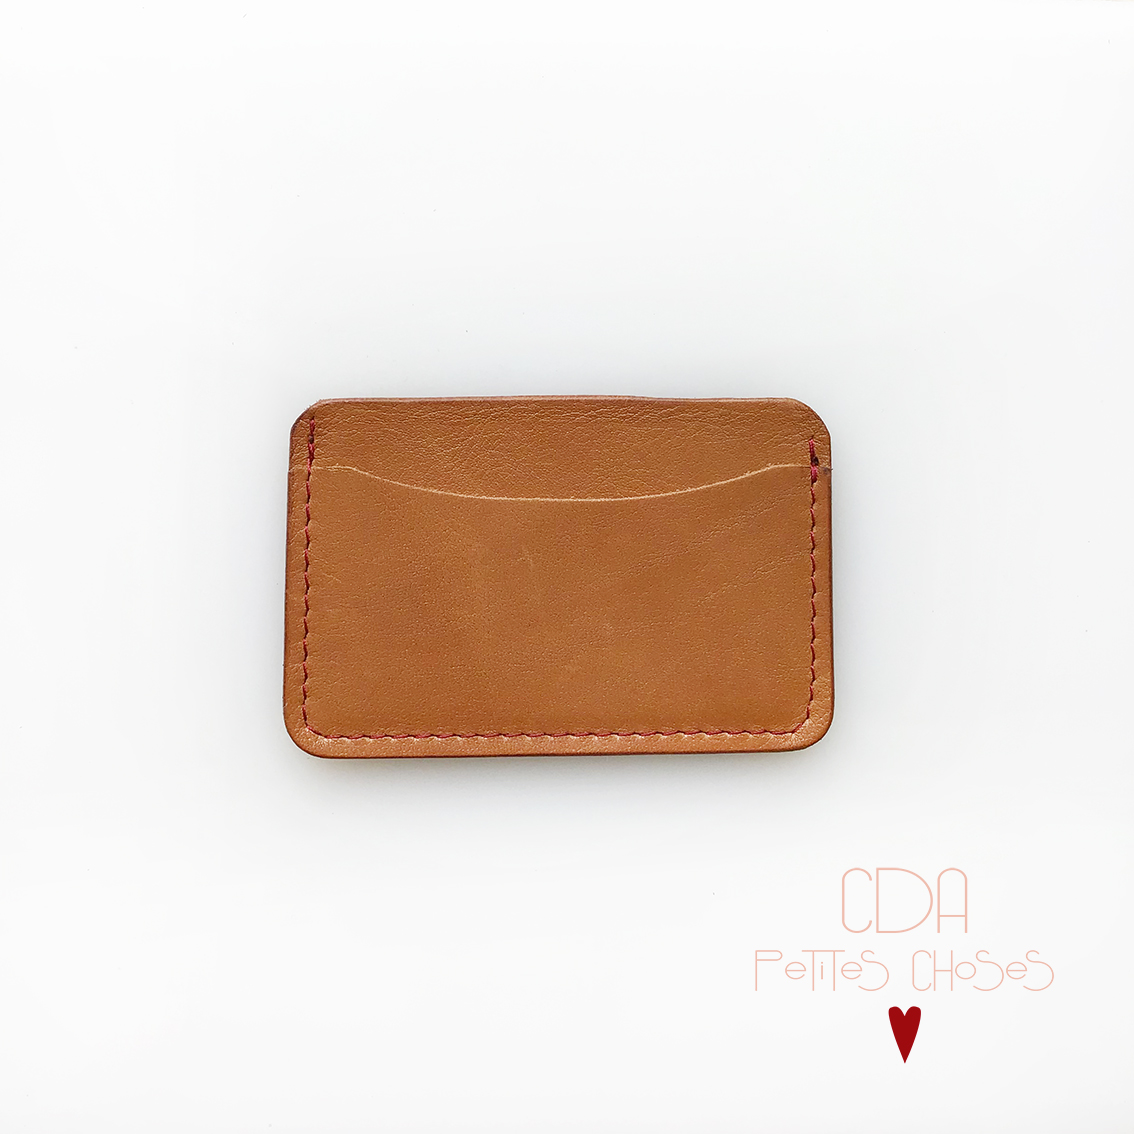 porte-carte-double-en-cuir-sienne-1 CDA Petites Choses